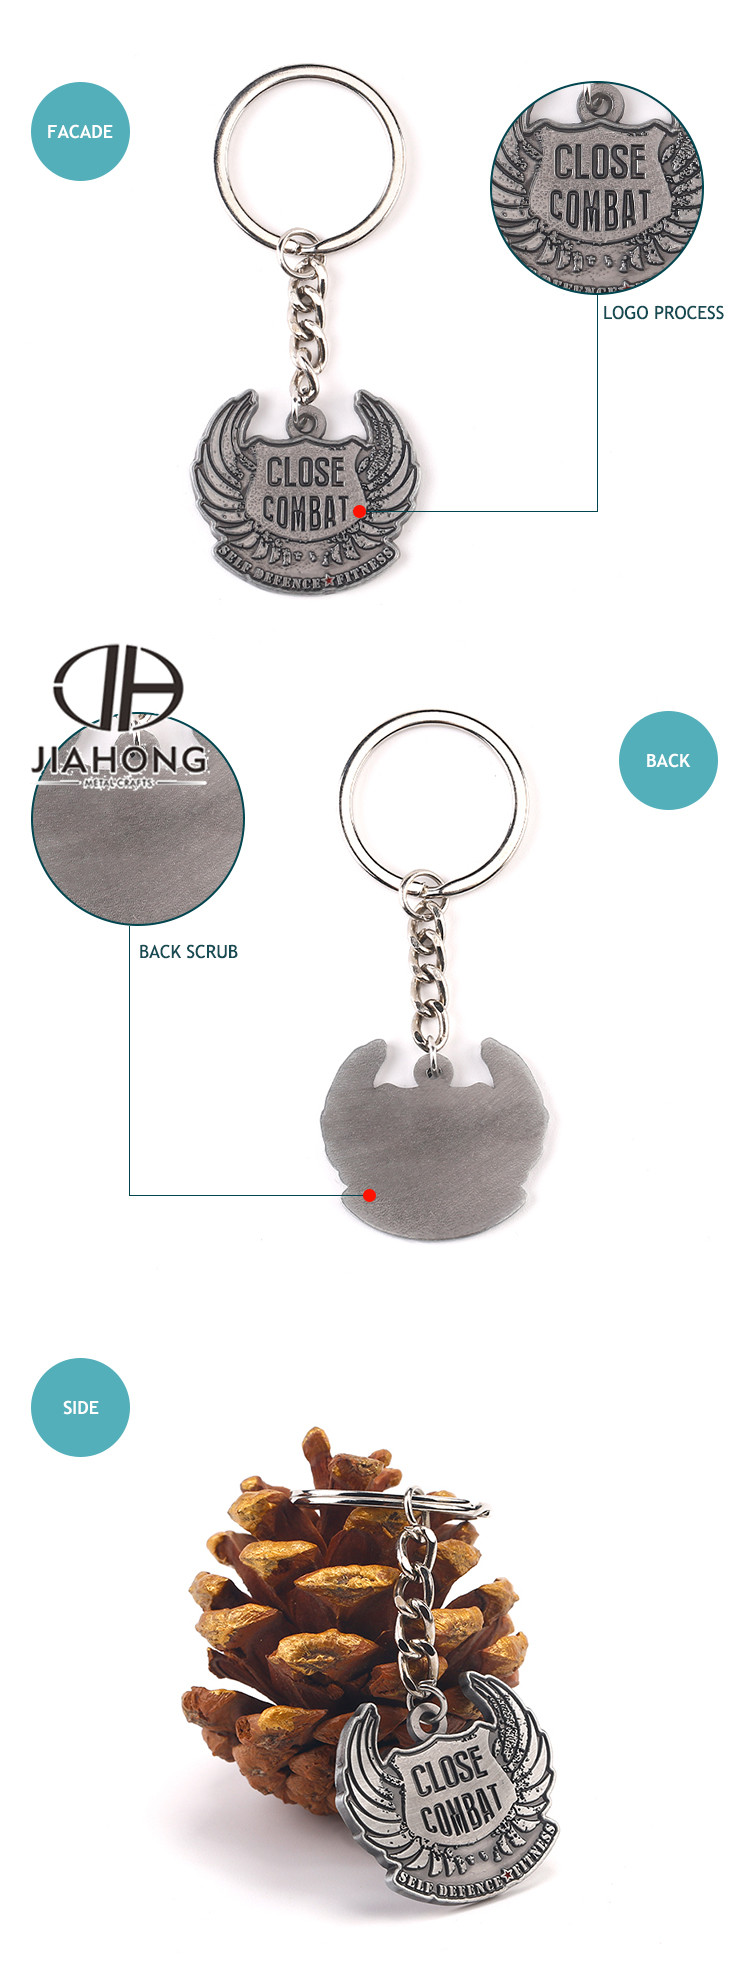 Compact keyring/ key holder/ key chain helmet with logo